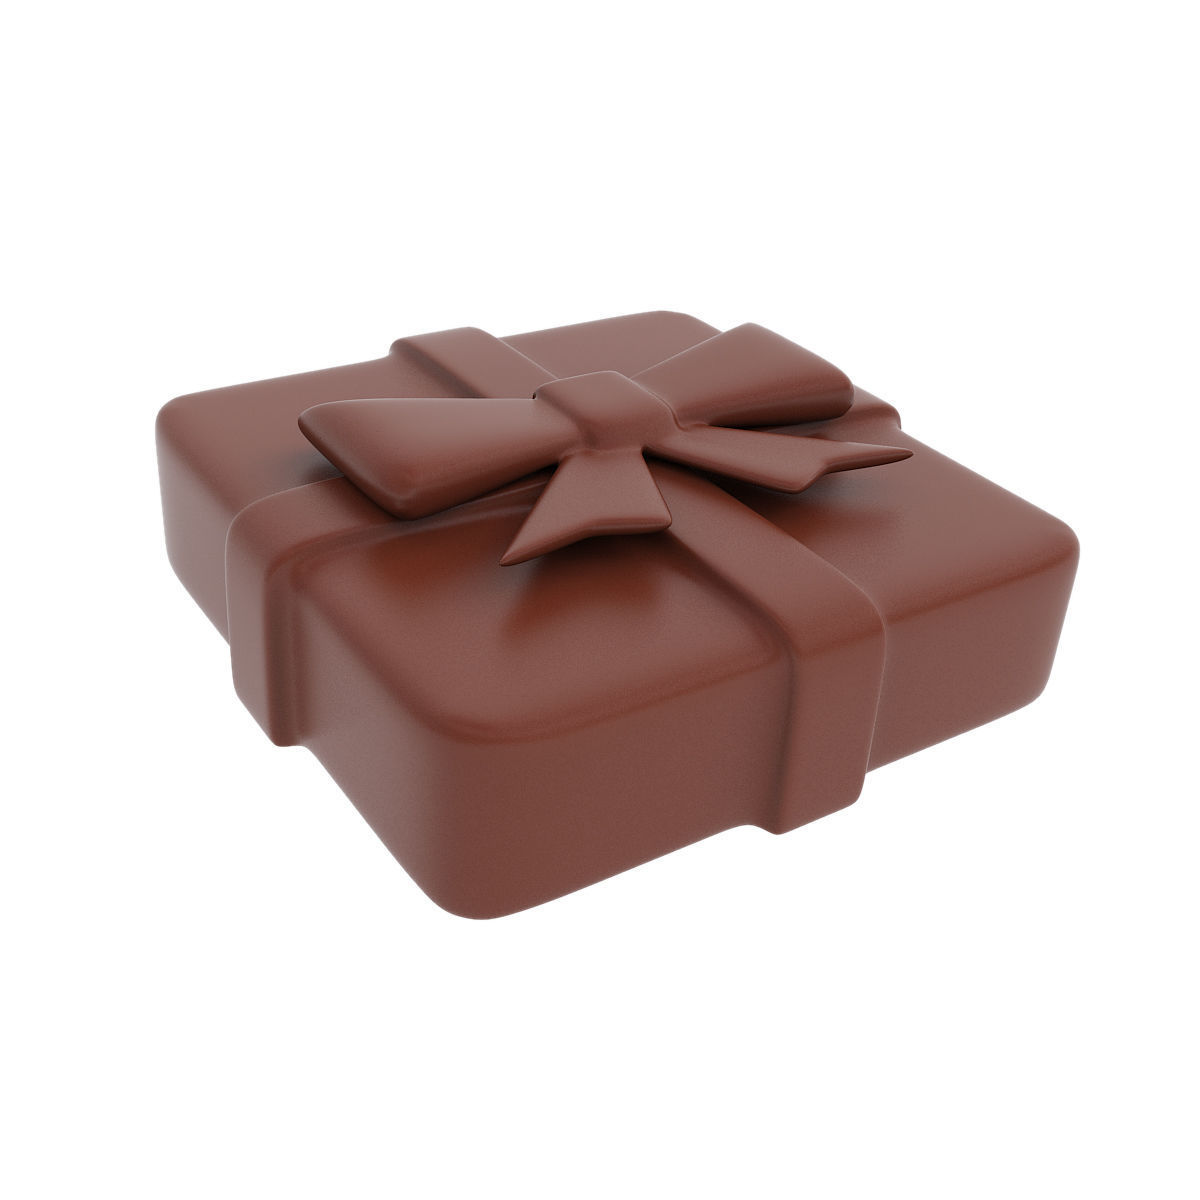 Chocolate present figurine